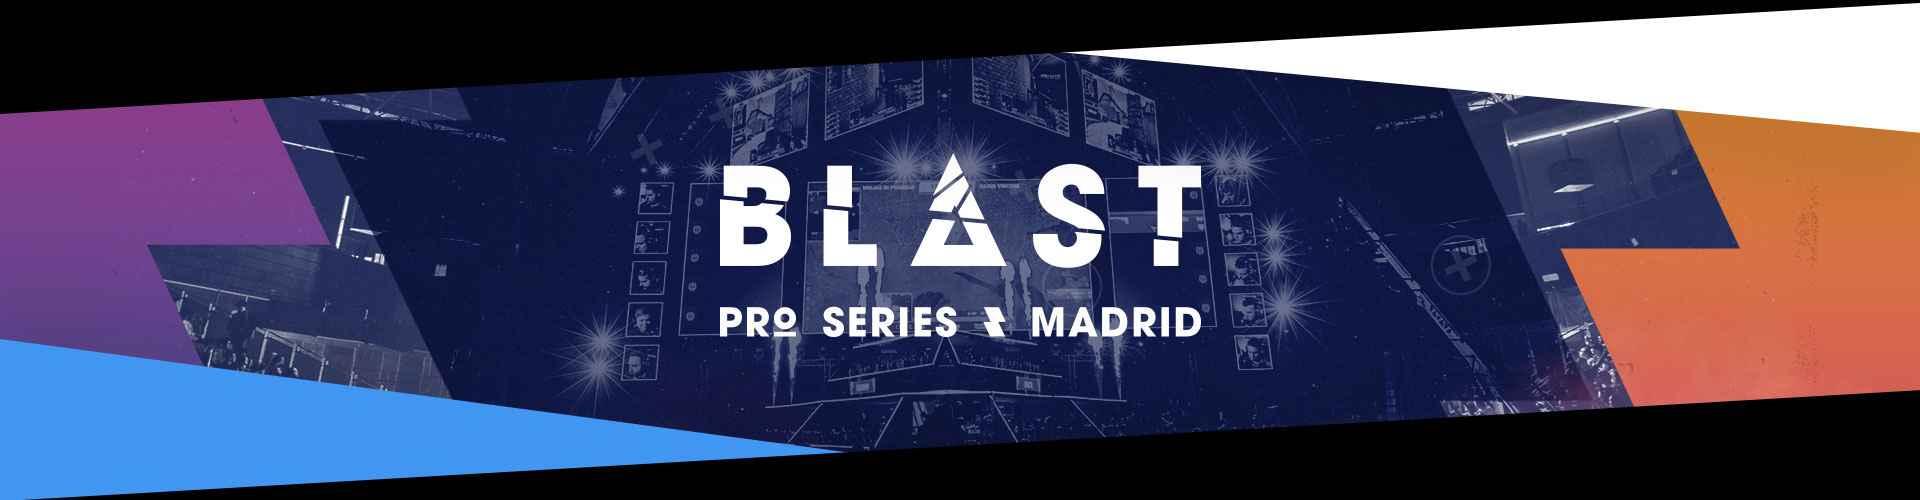 Counter-Strike: Global Offensive - Blast Pro Series Madrid